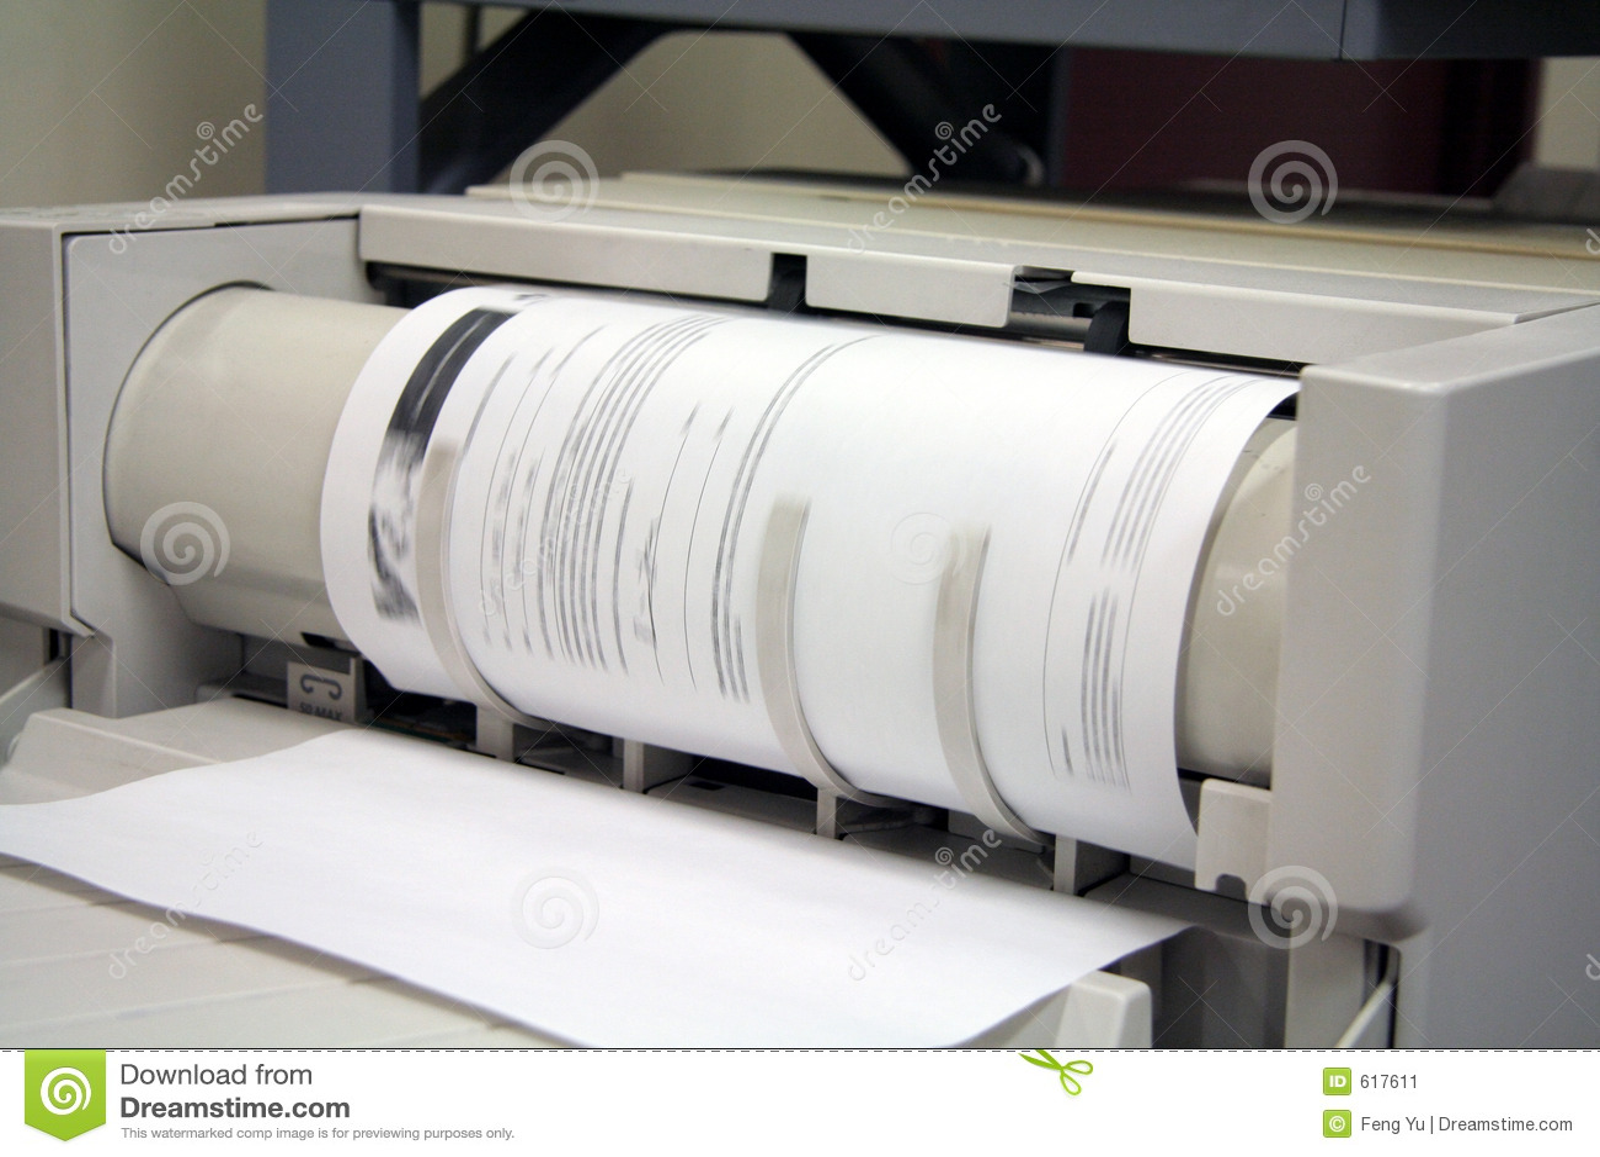 Copiadora, impressora, fax